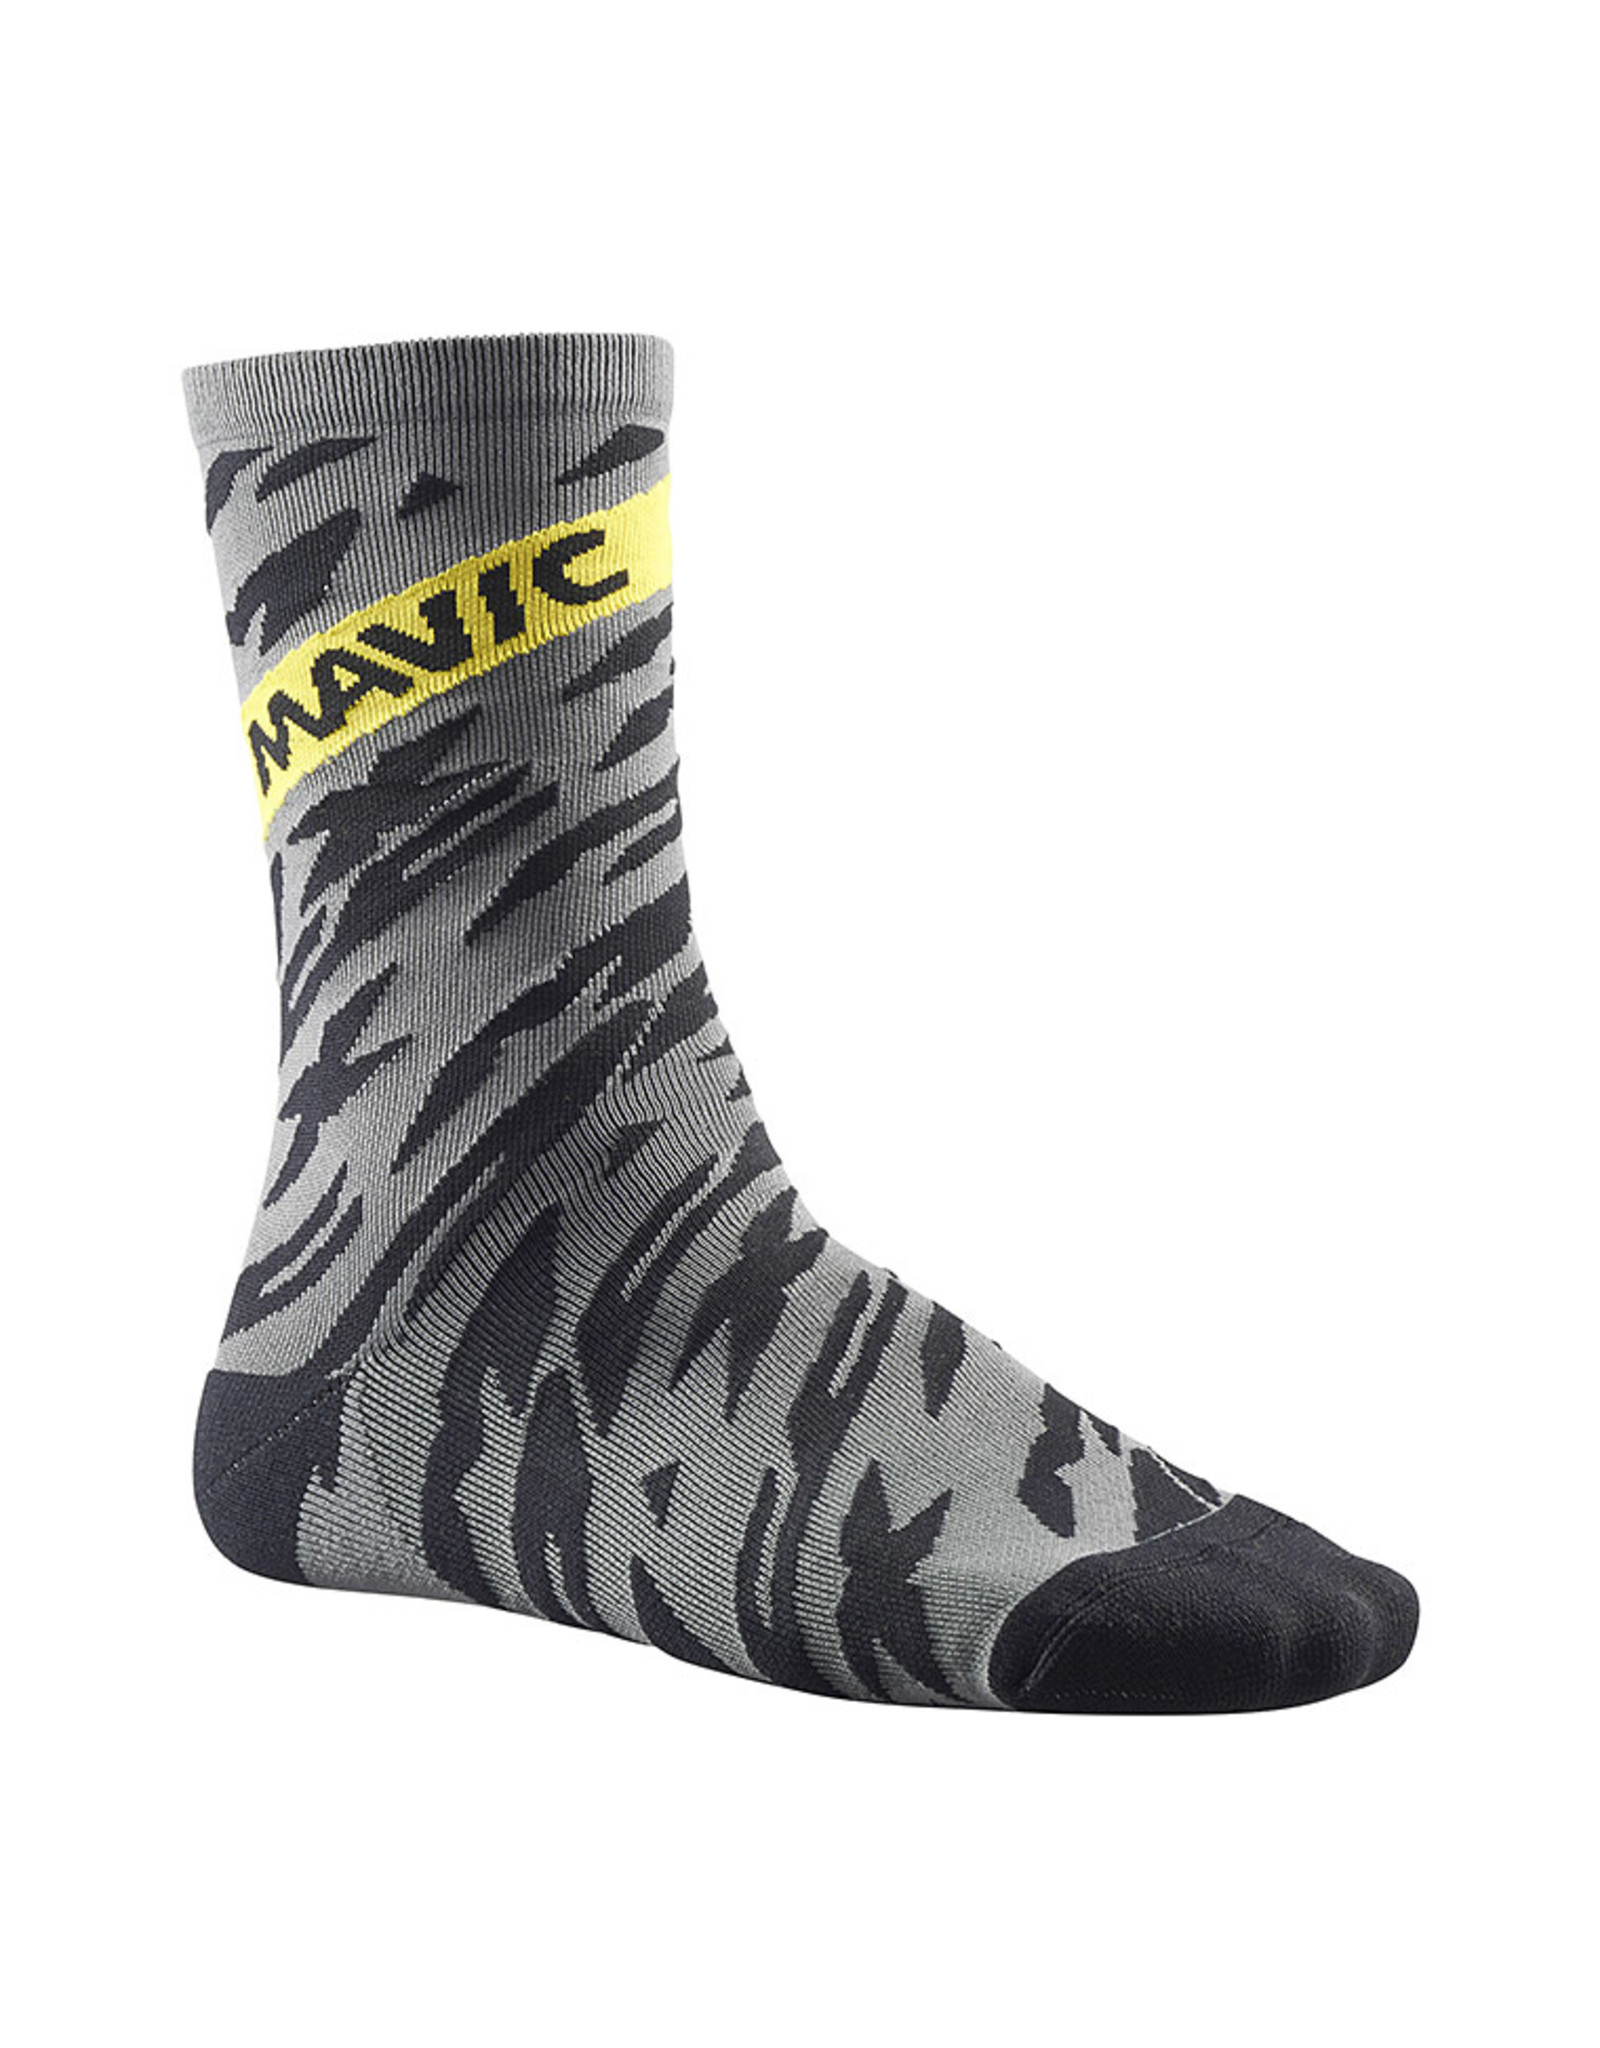 MAVIC Deemax Pro High Sock - Smoked Pearl/Black